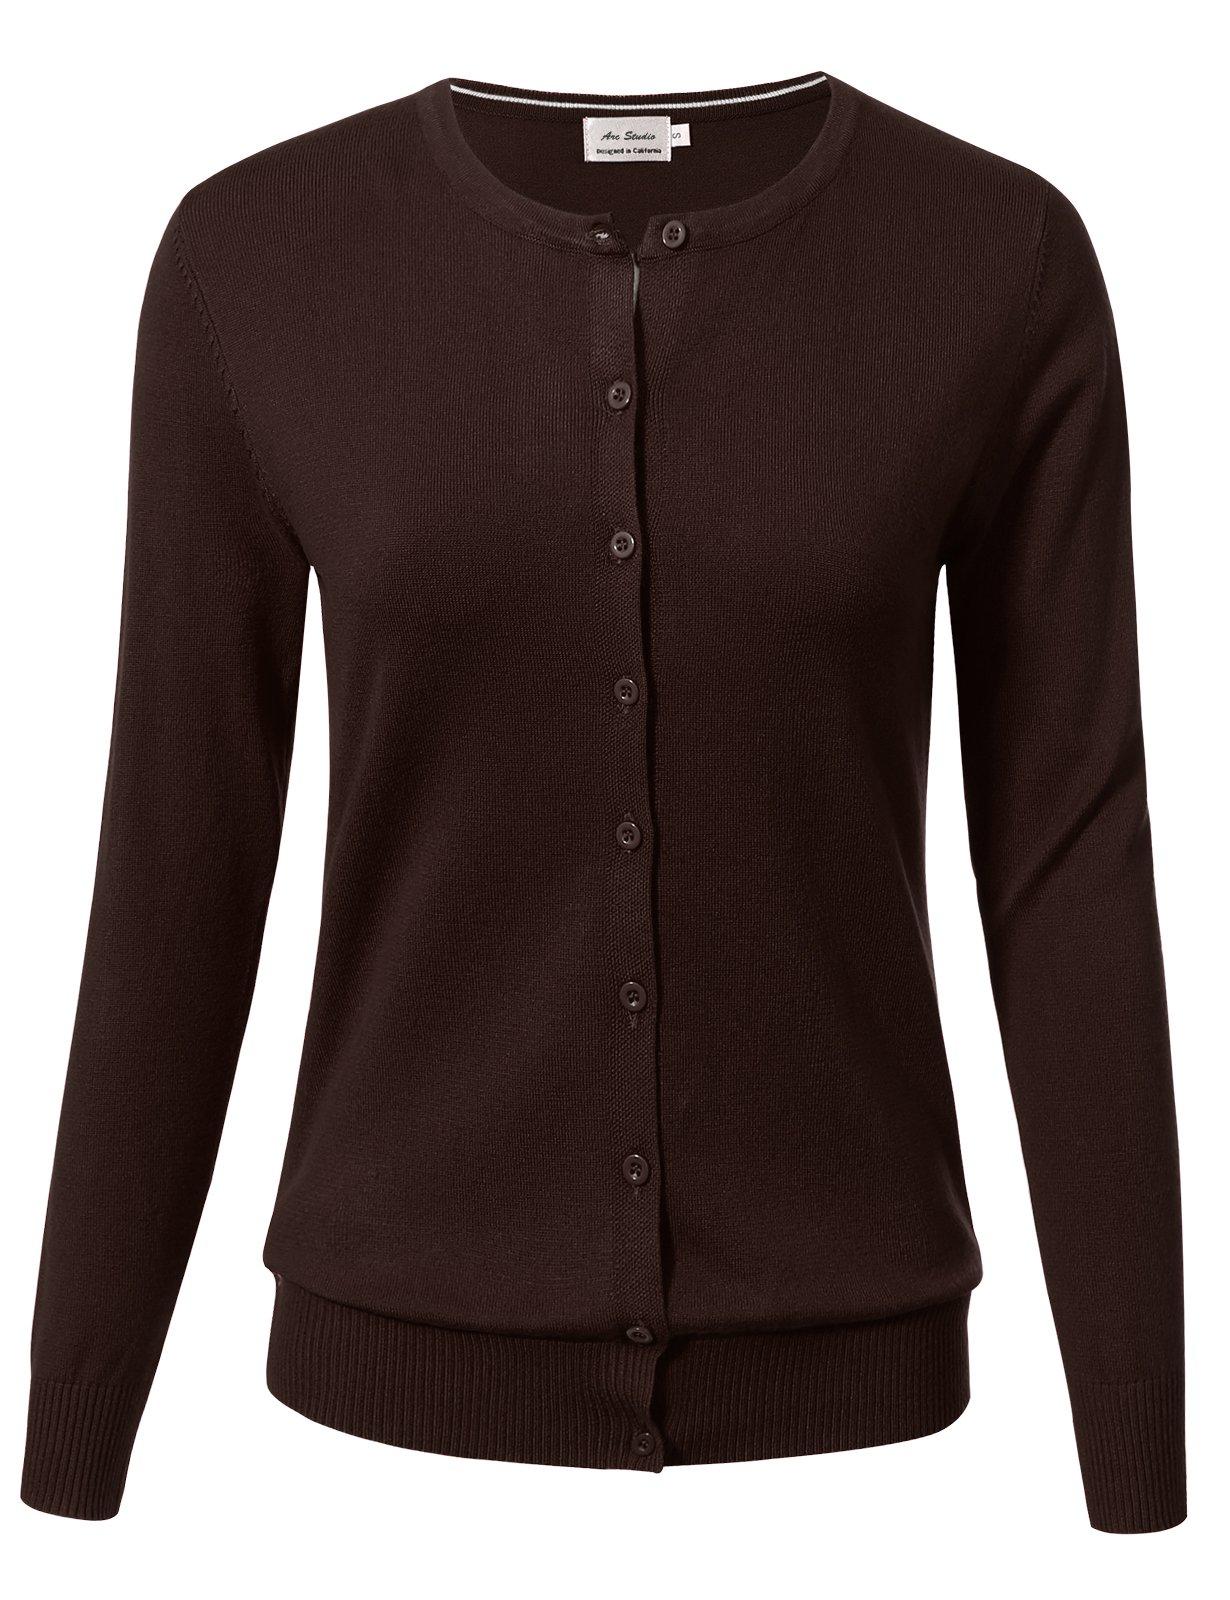 ARC Studio Women Button Down Long Sleeve Crewneck Soft Knit Cardigan Sweater 1XL Brown